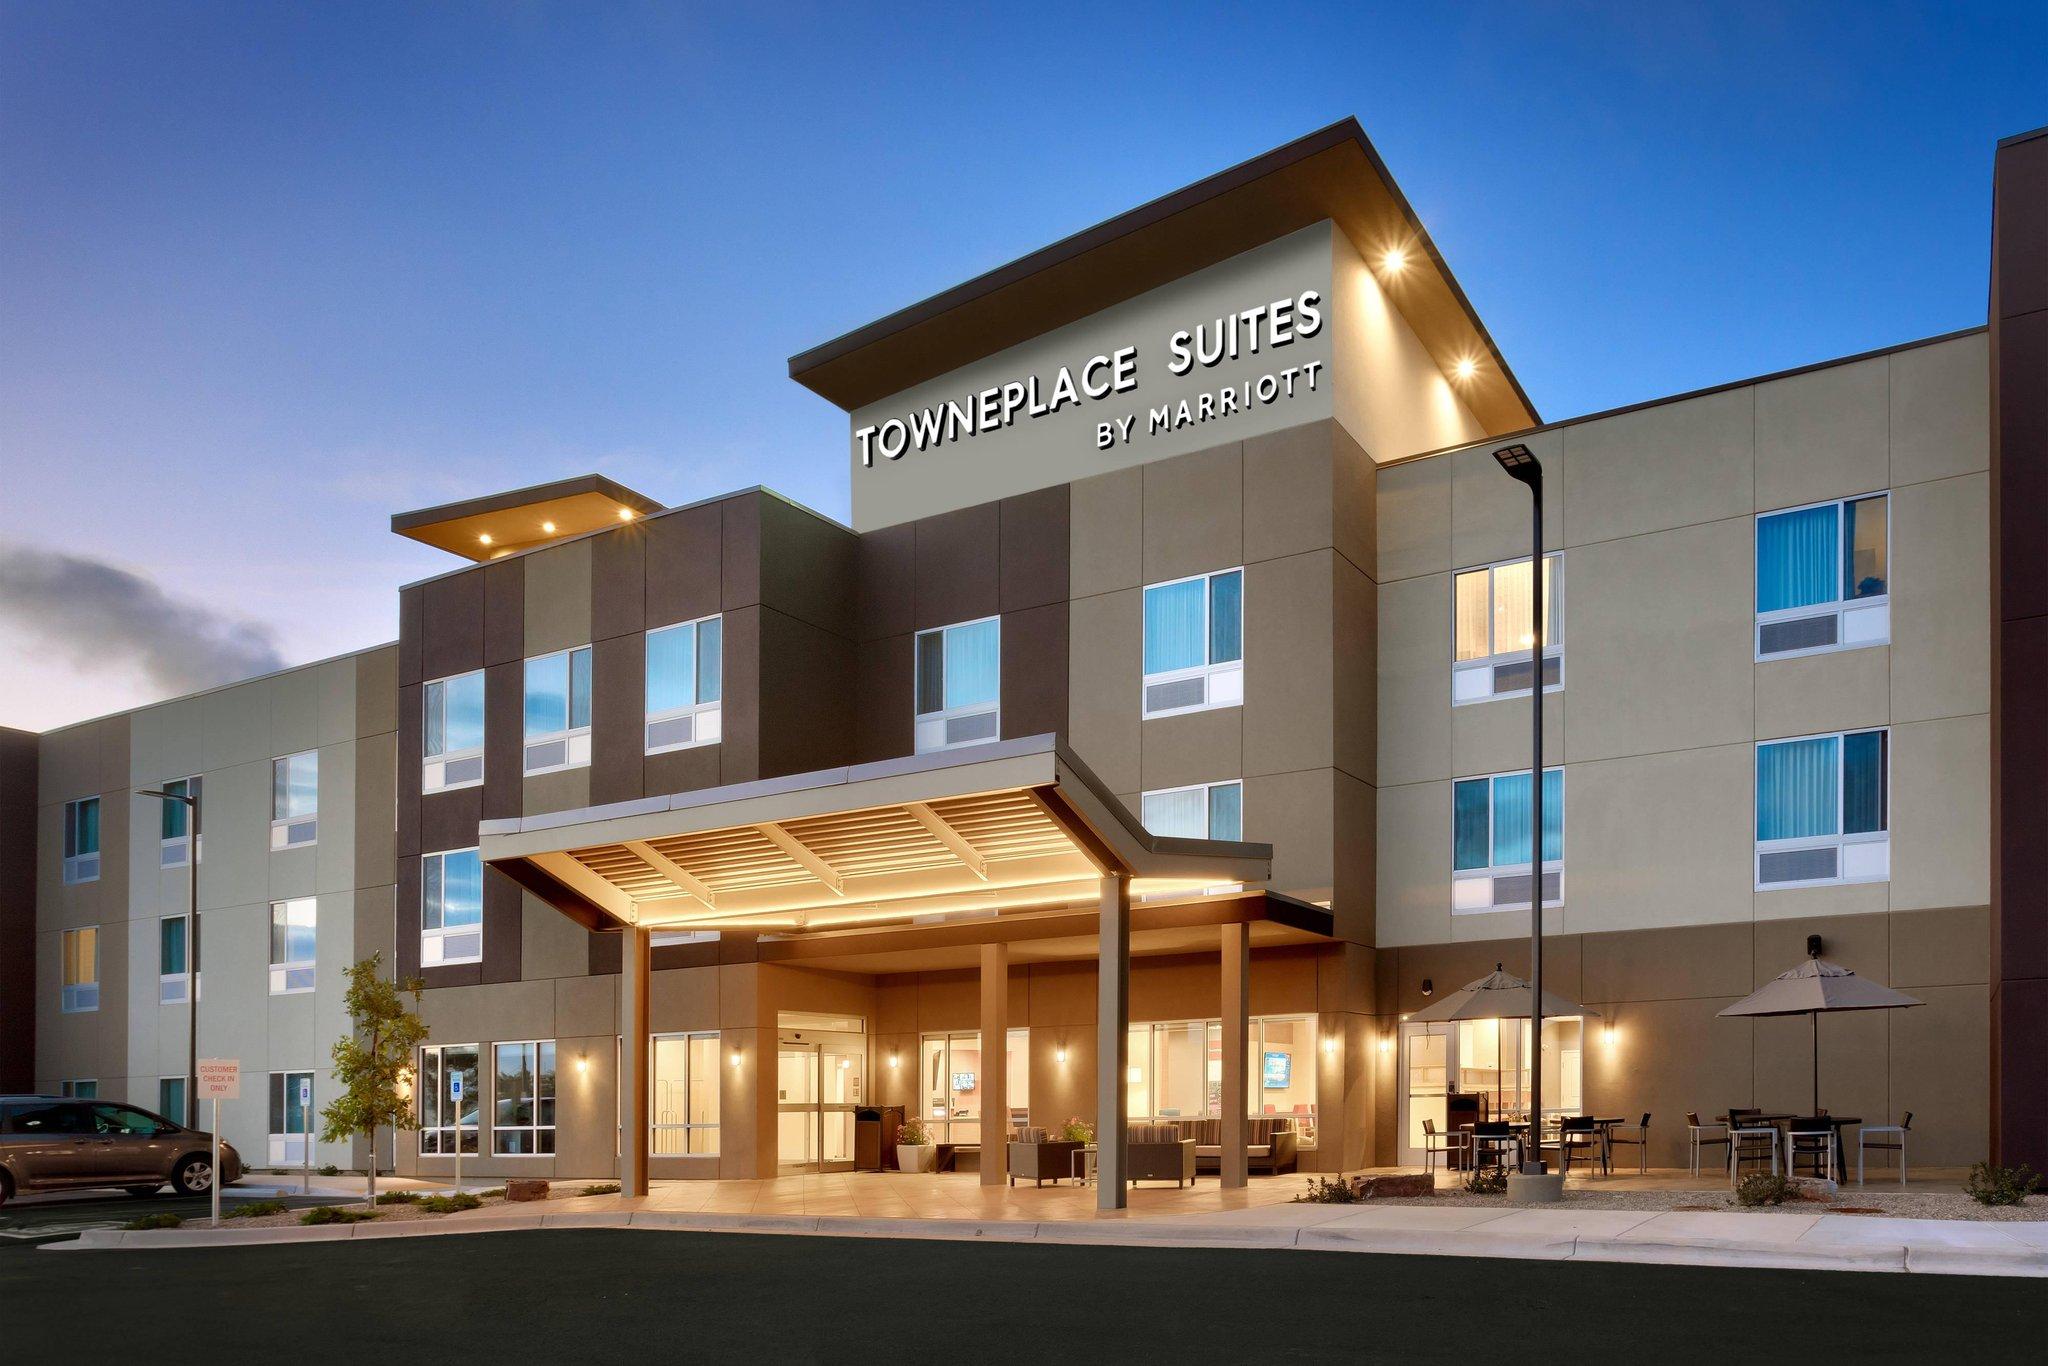 TownePlace Suites by Marriott Clovis